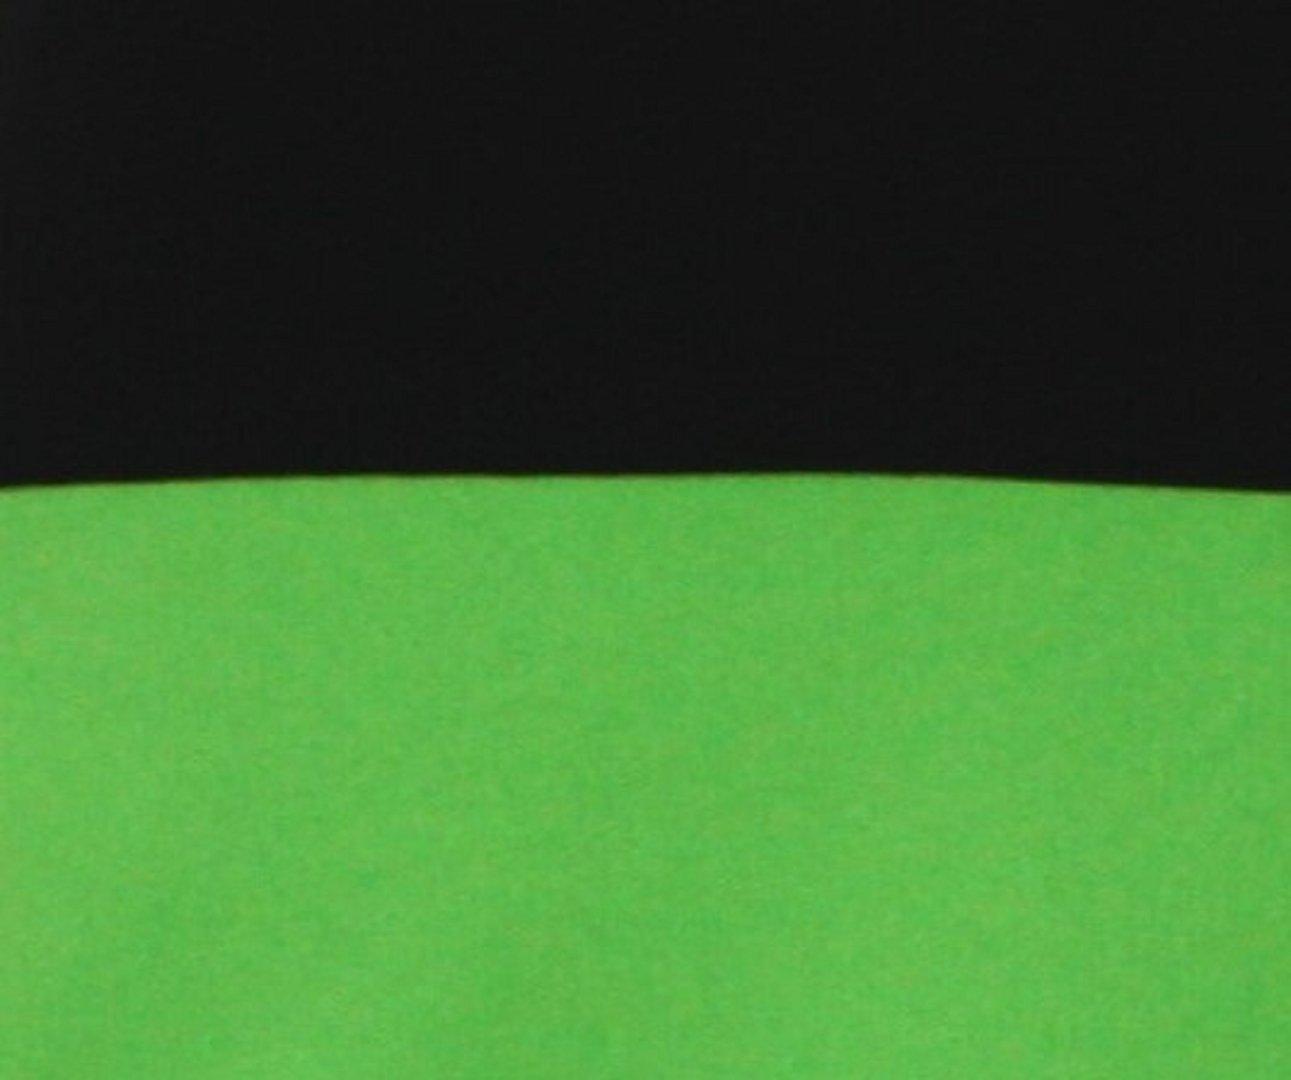 c48fae2387f7 Minirock Hellgrün Grün